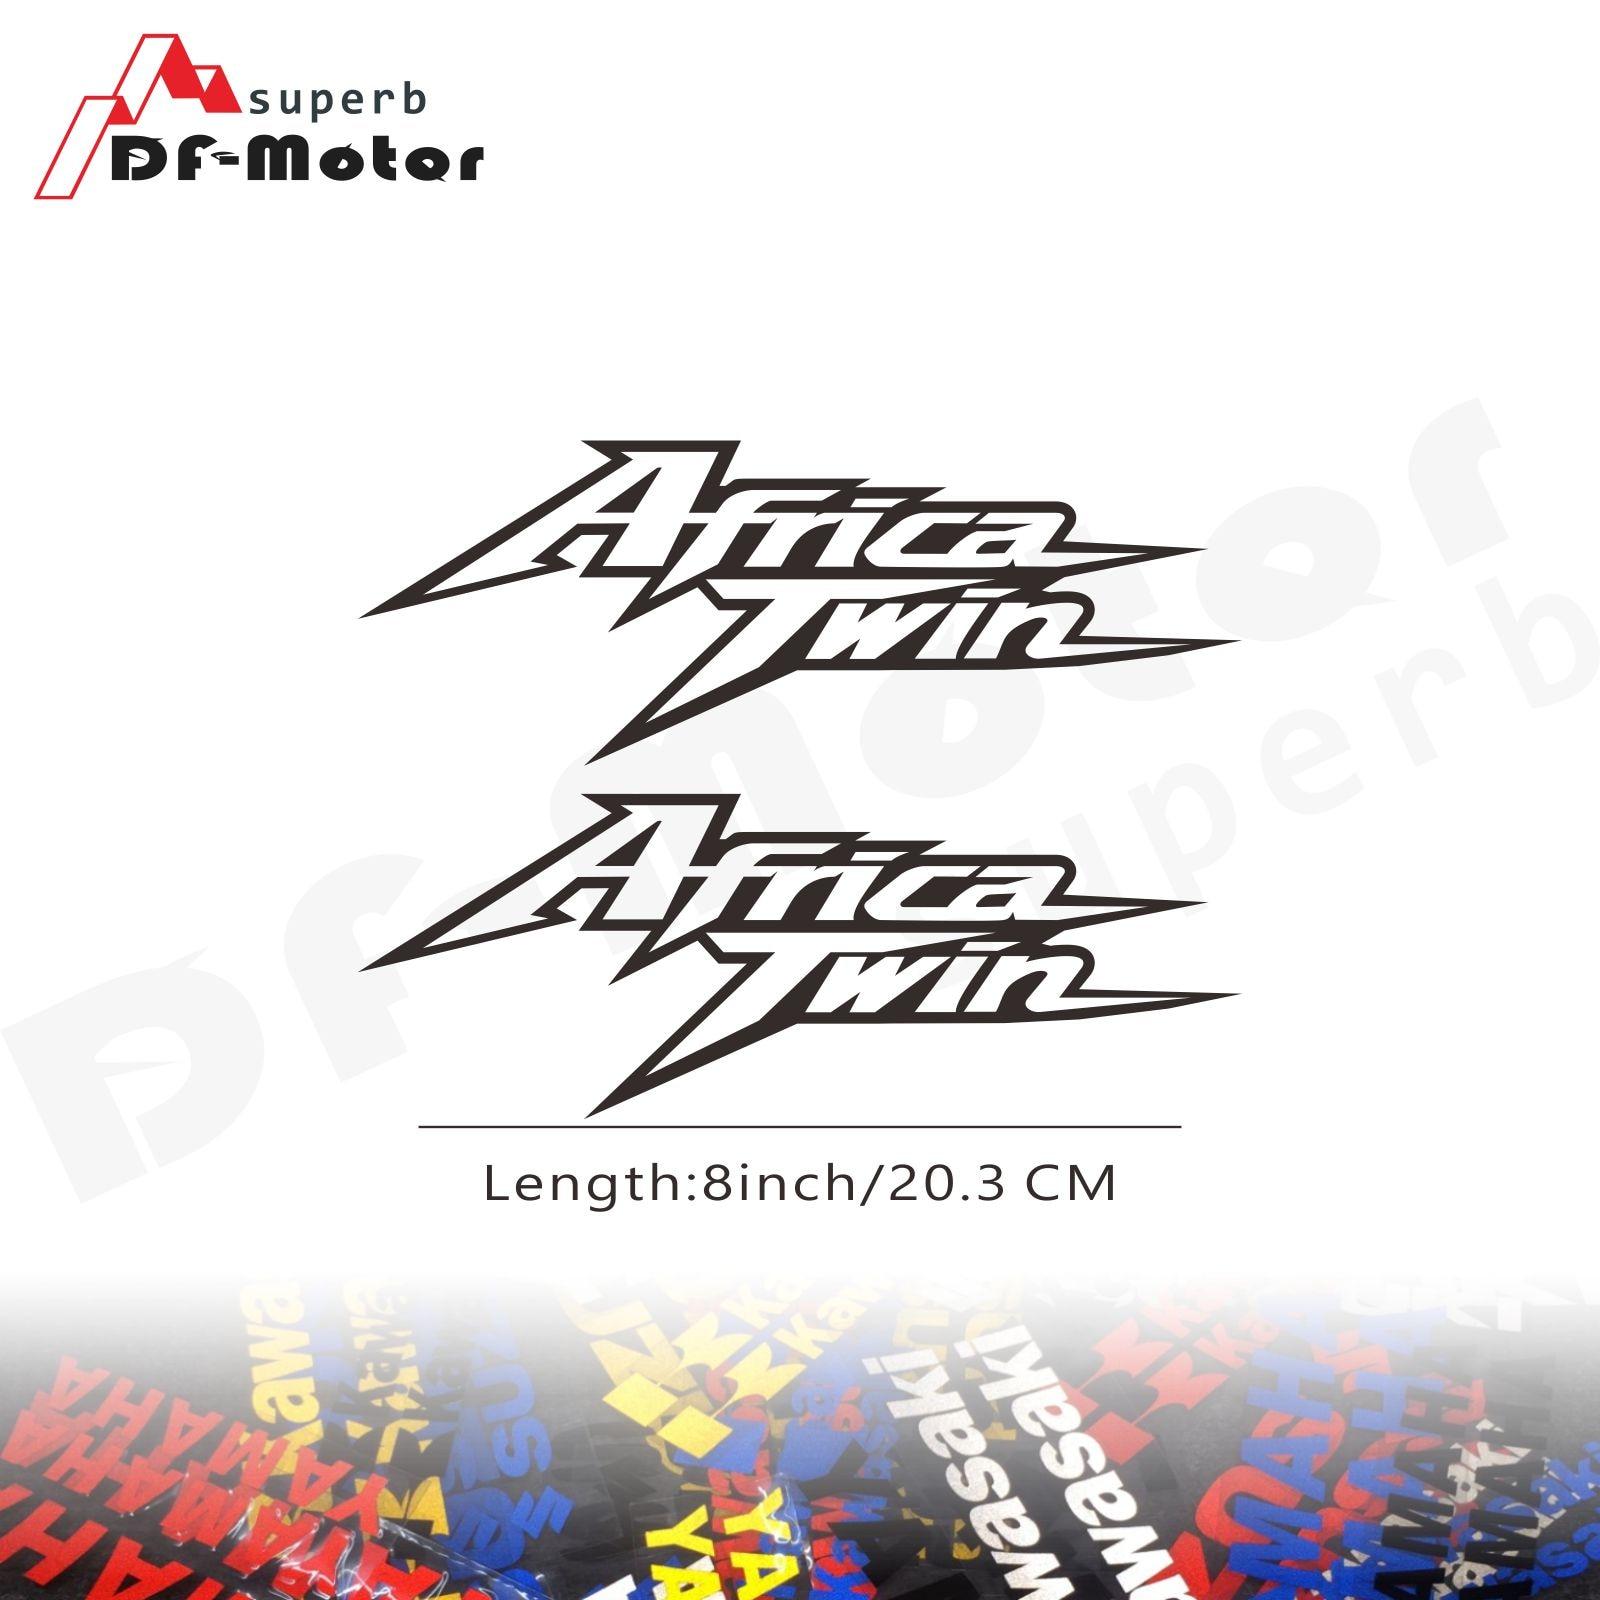 8Inch Reflective Sticker Decal Motorcycle Car Sticker Wheels Fairing Helmet Sticker Decal For Honda CRF1000L Africa Twin